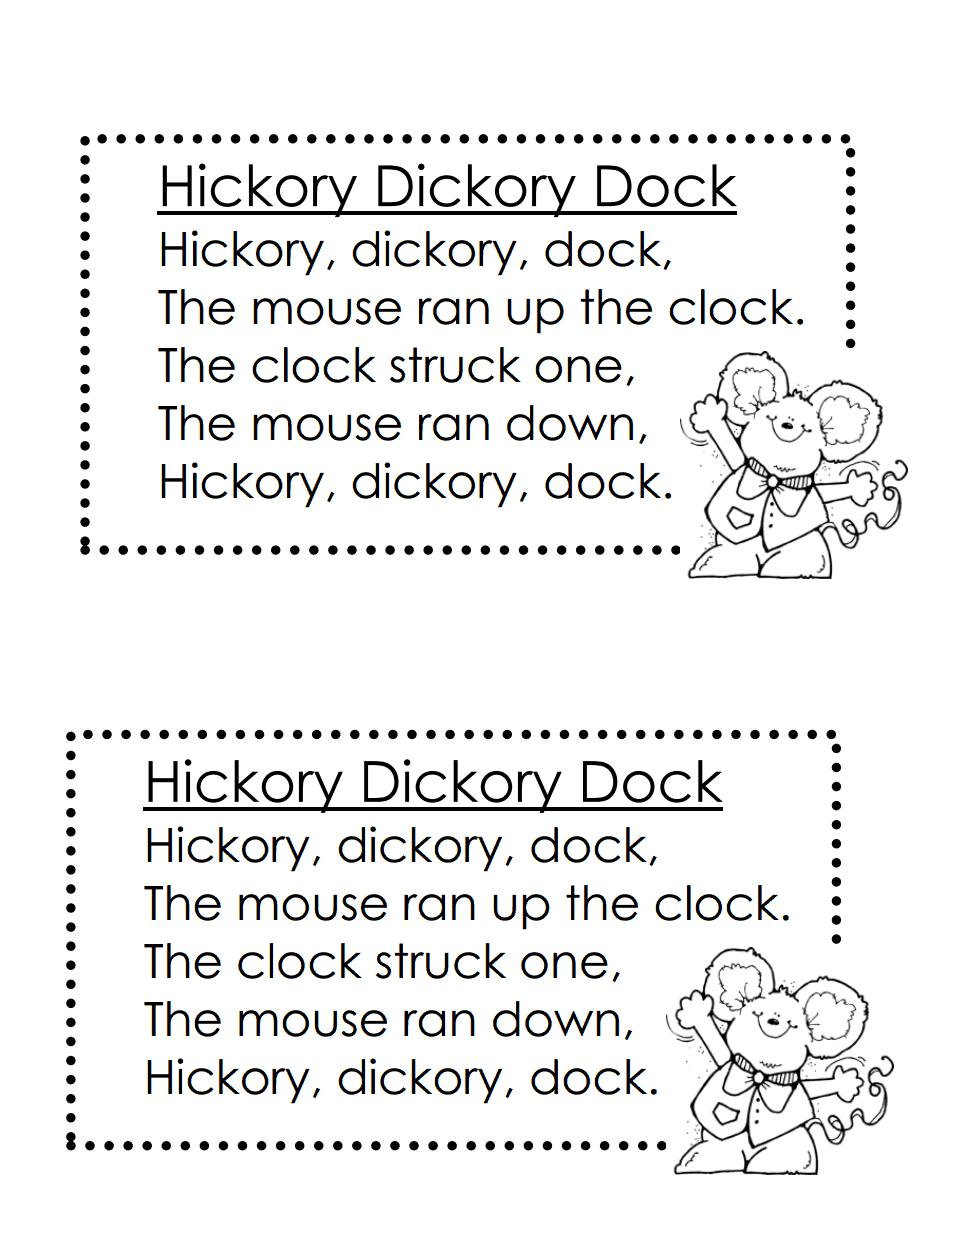 nursery rhymes.pdf Nursery rhymes, Rhymes, Nursery